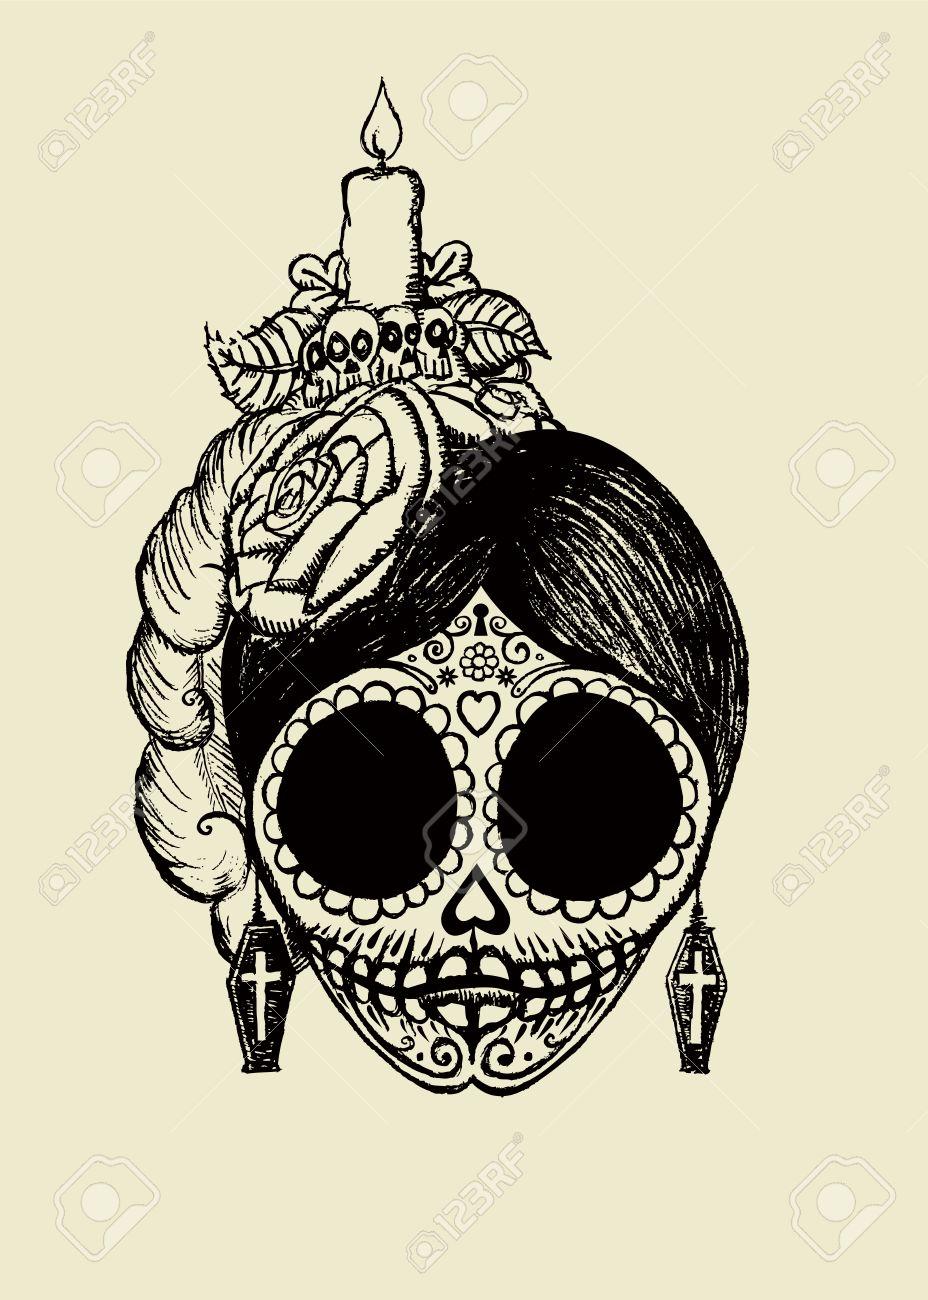 La Catrinamexican Sugar Skullisolated Vector Illustration Royalty